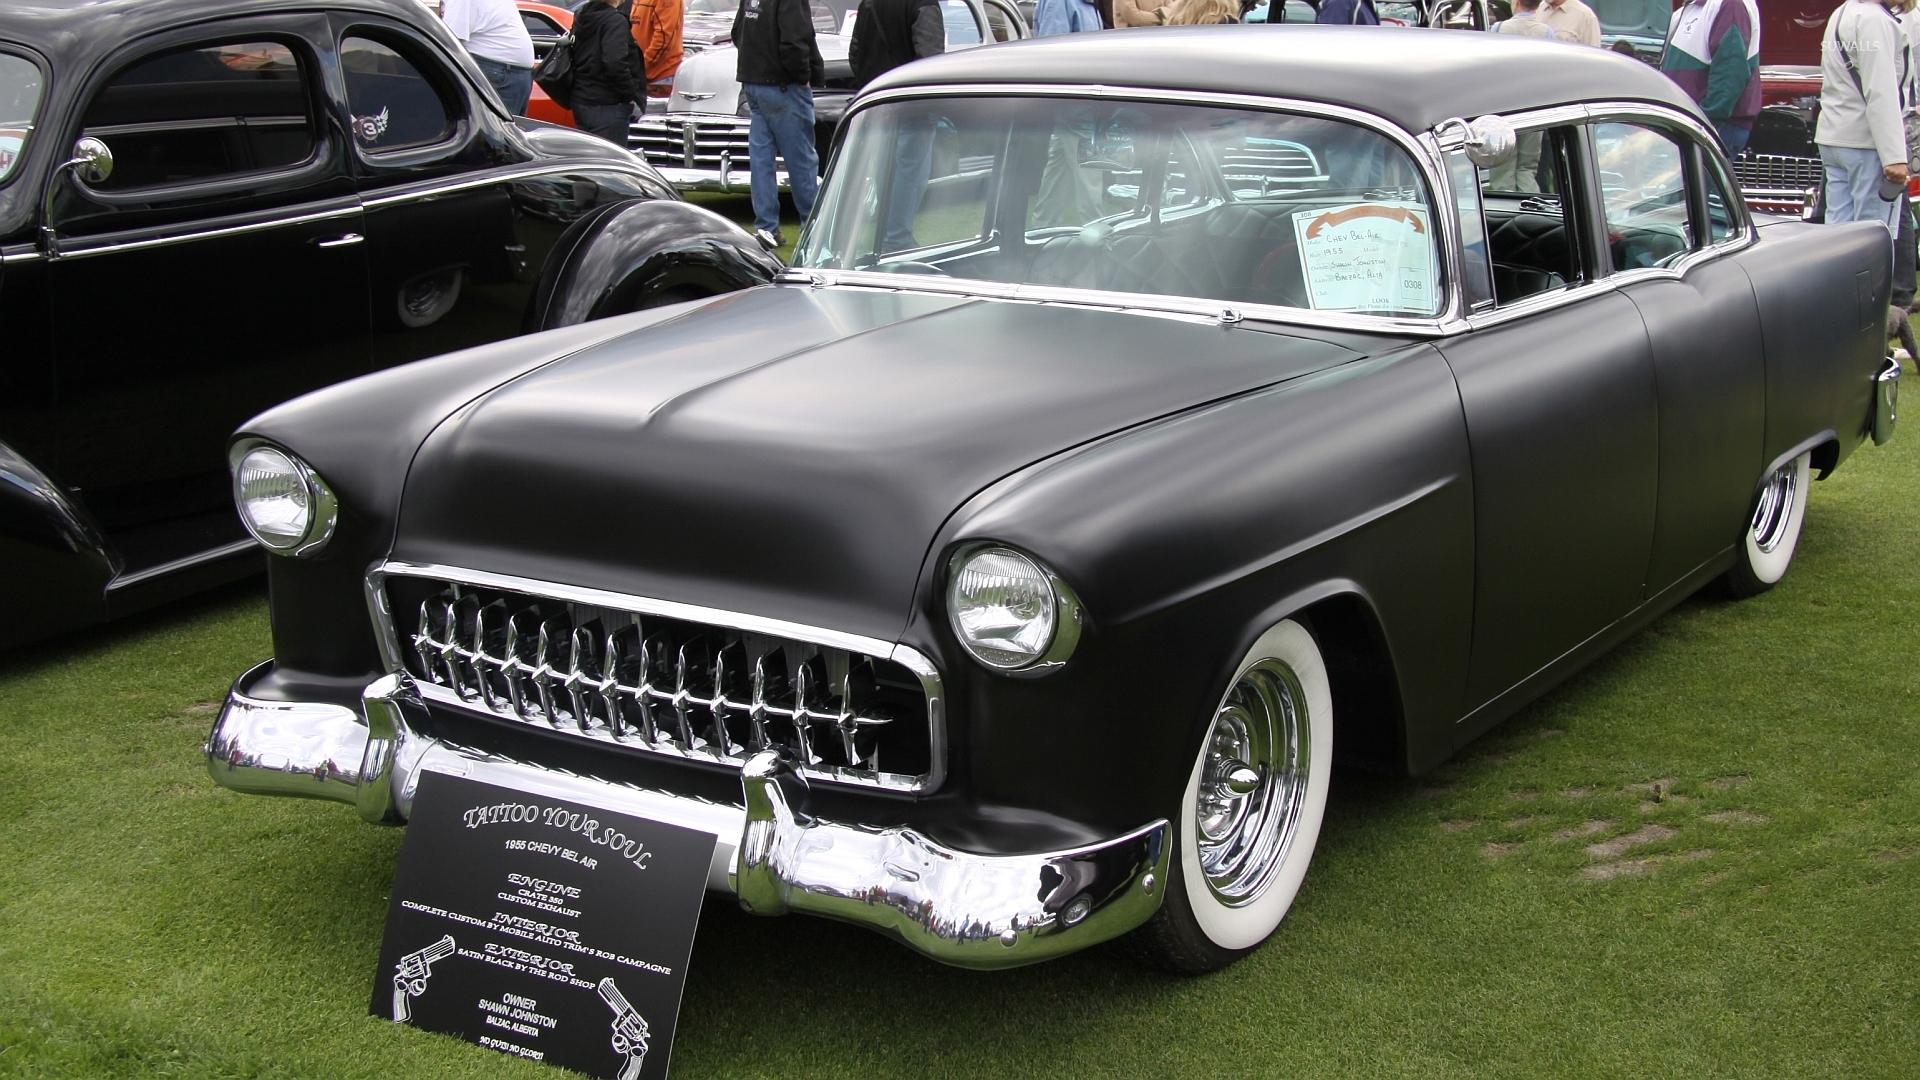 1955 Chevrolet Bel Air wallpaper   Car wallpapers   33929 1680x1050